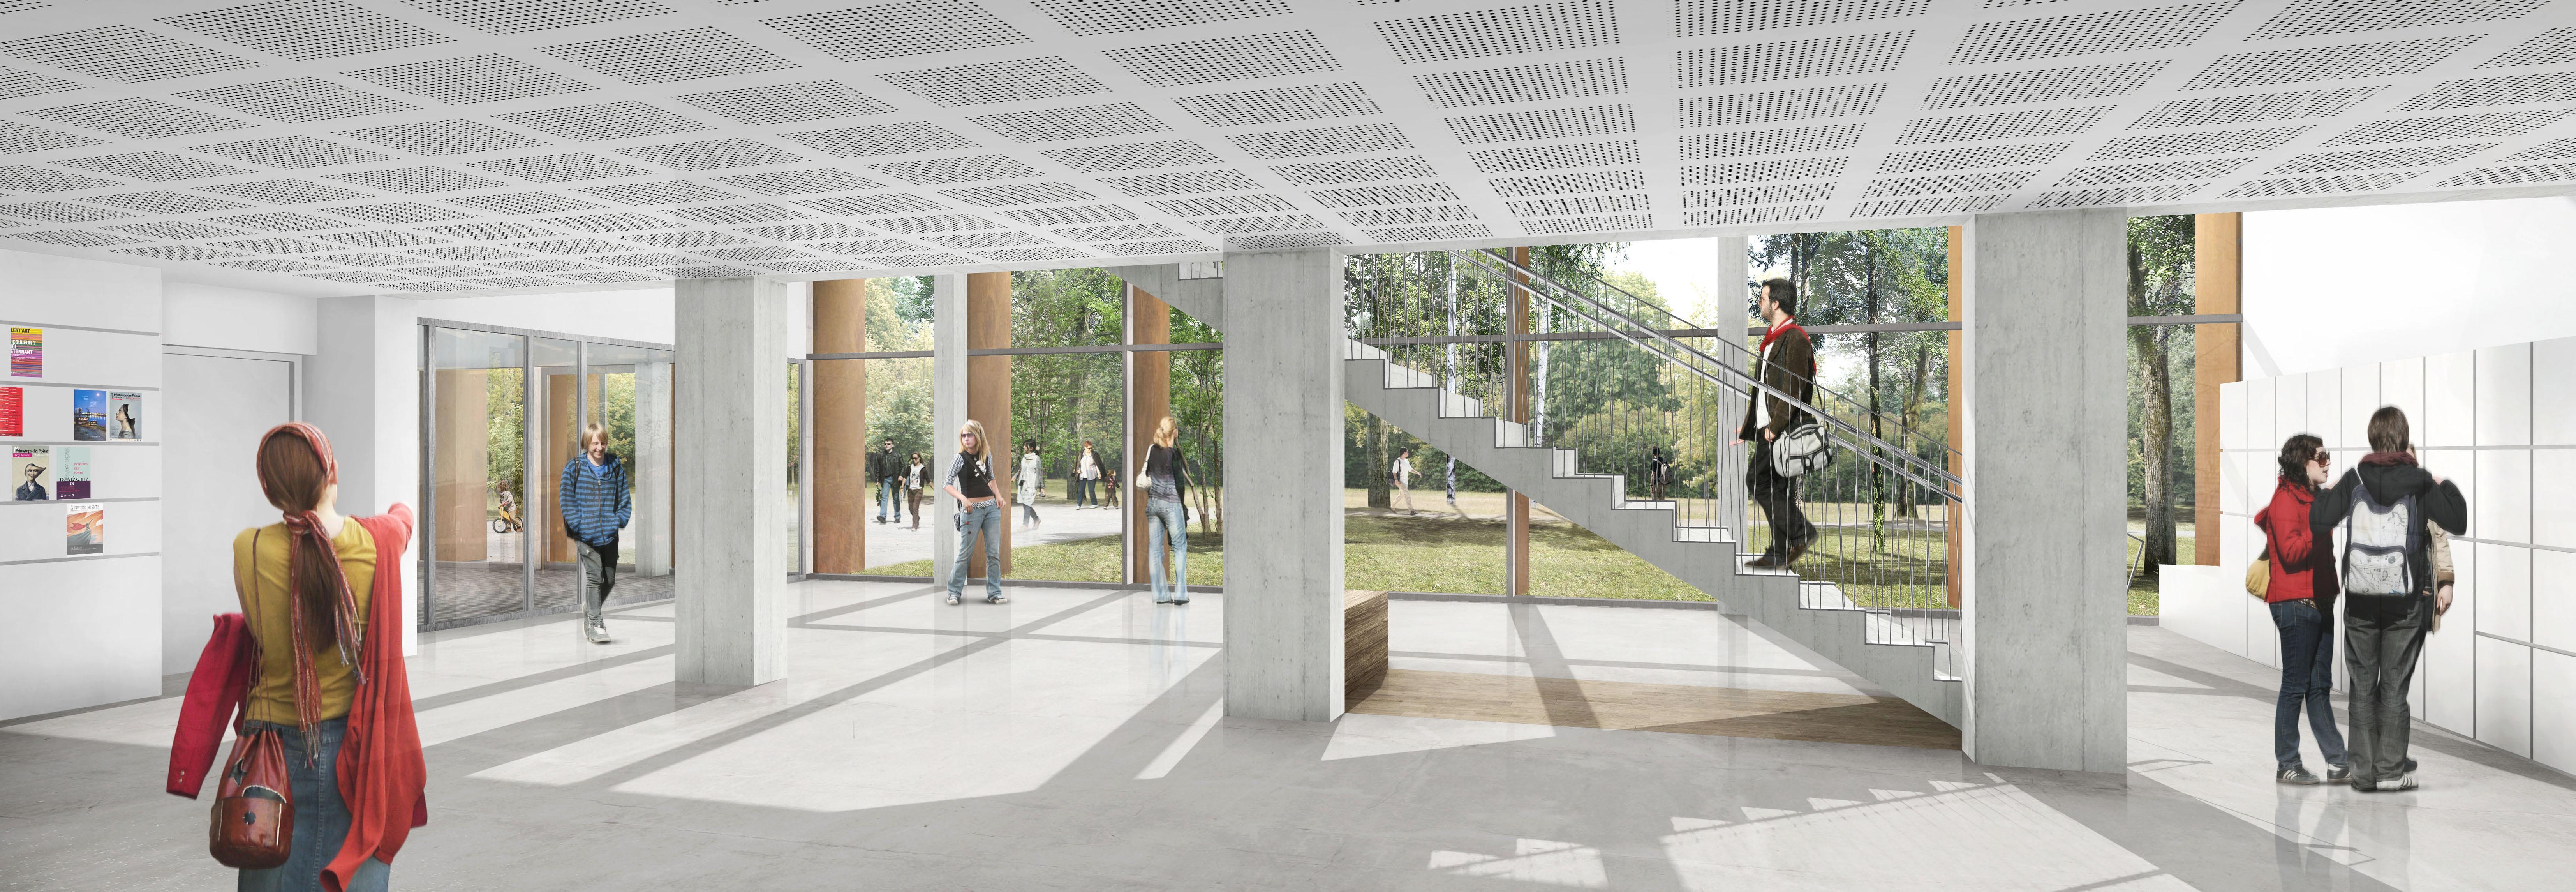 Haguenau : Alter&toit